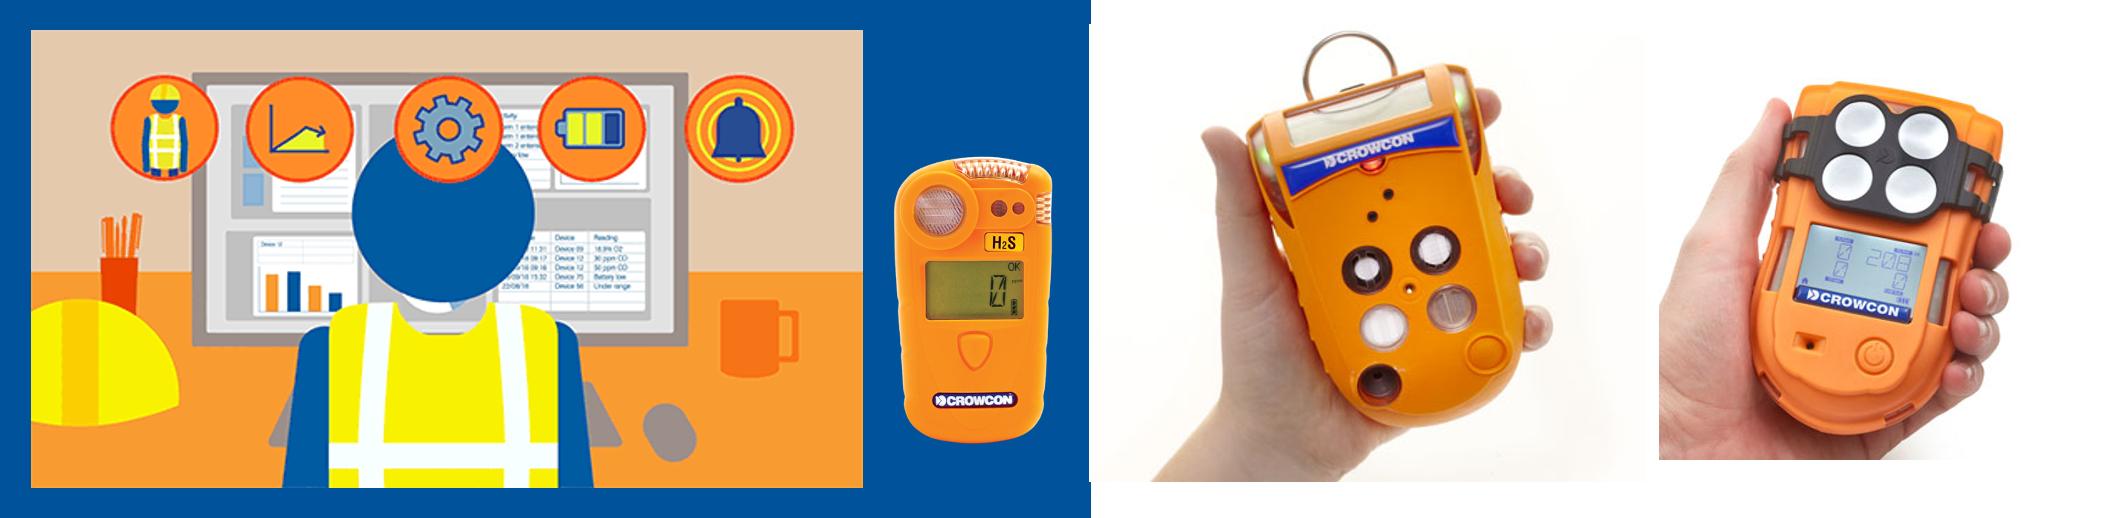 Cảm biến phát hiện khí Gas cầm tay Tetra 3 | Crowcon - UK